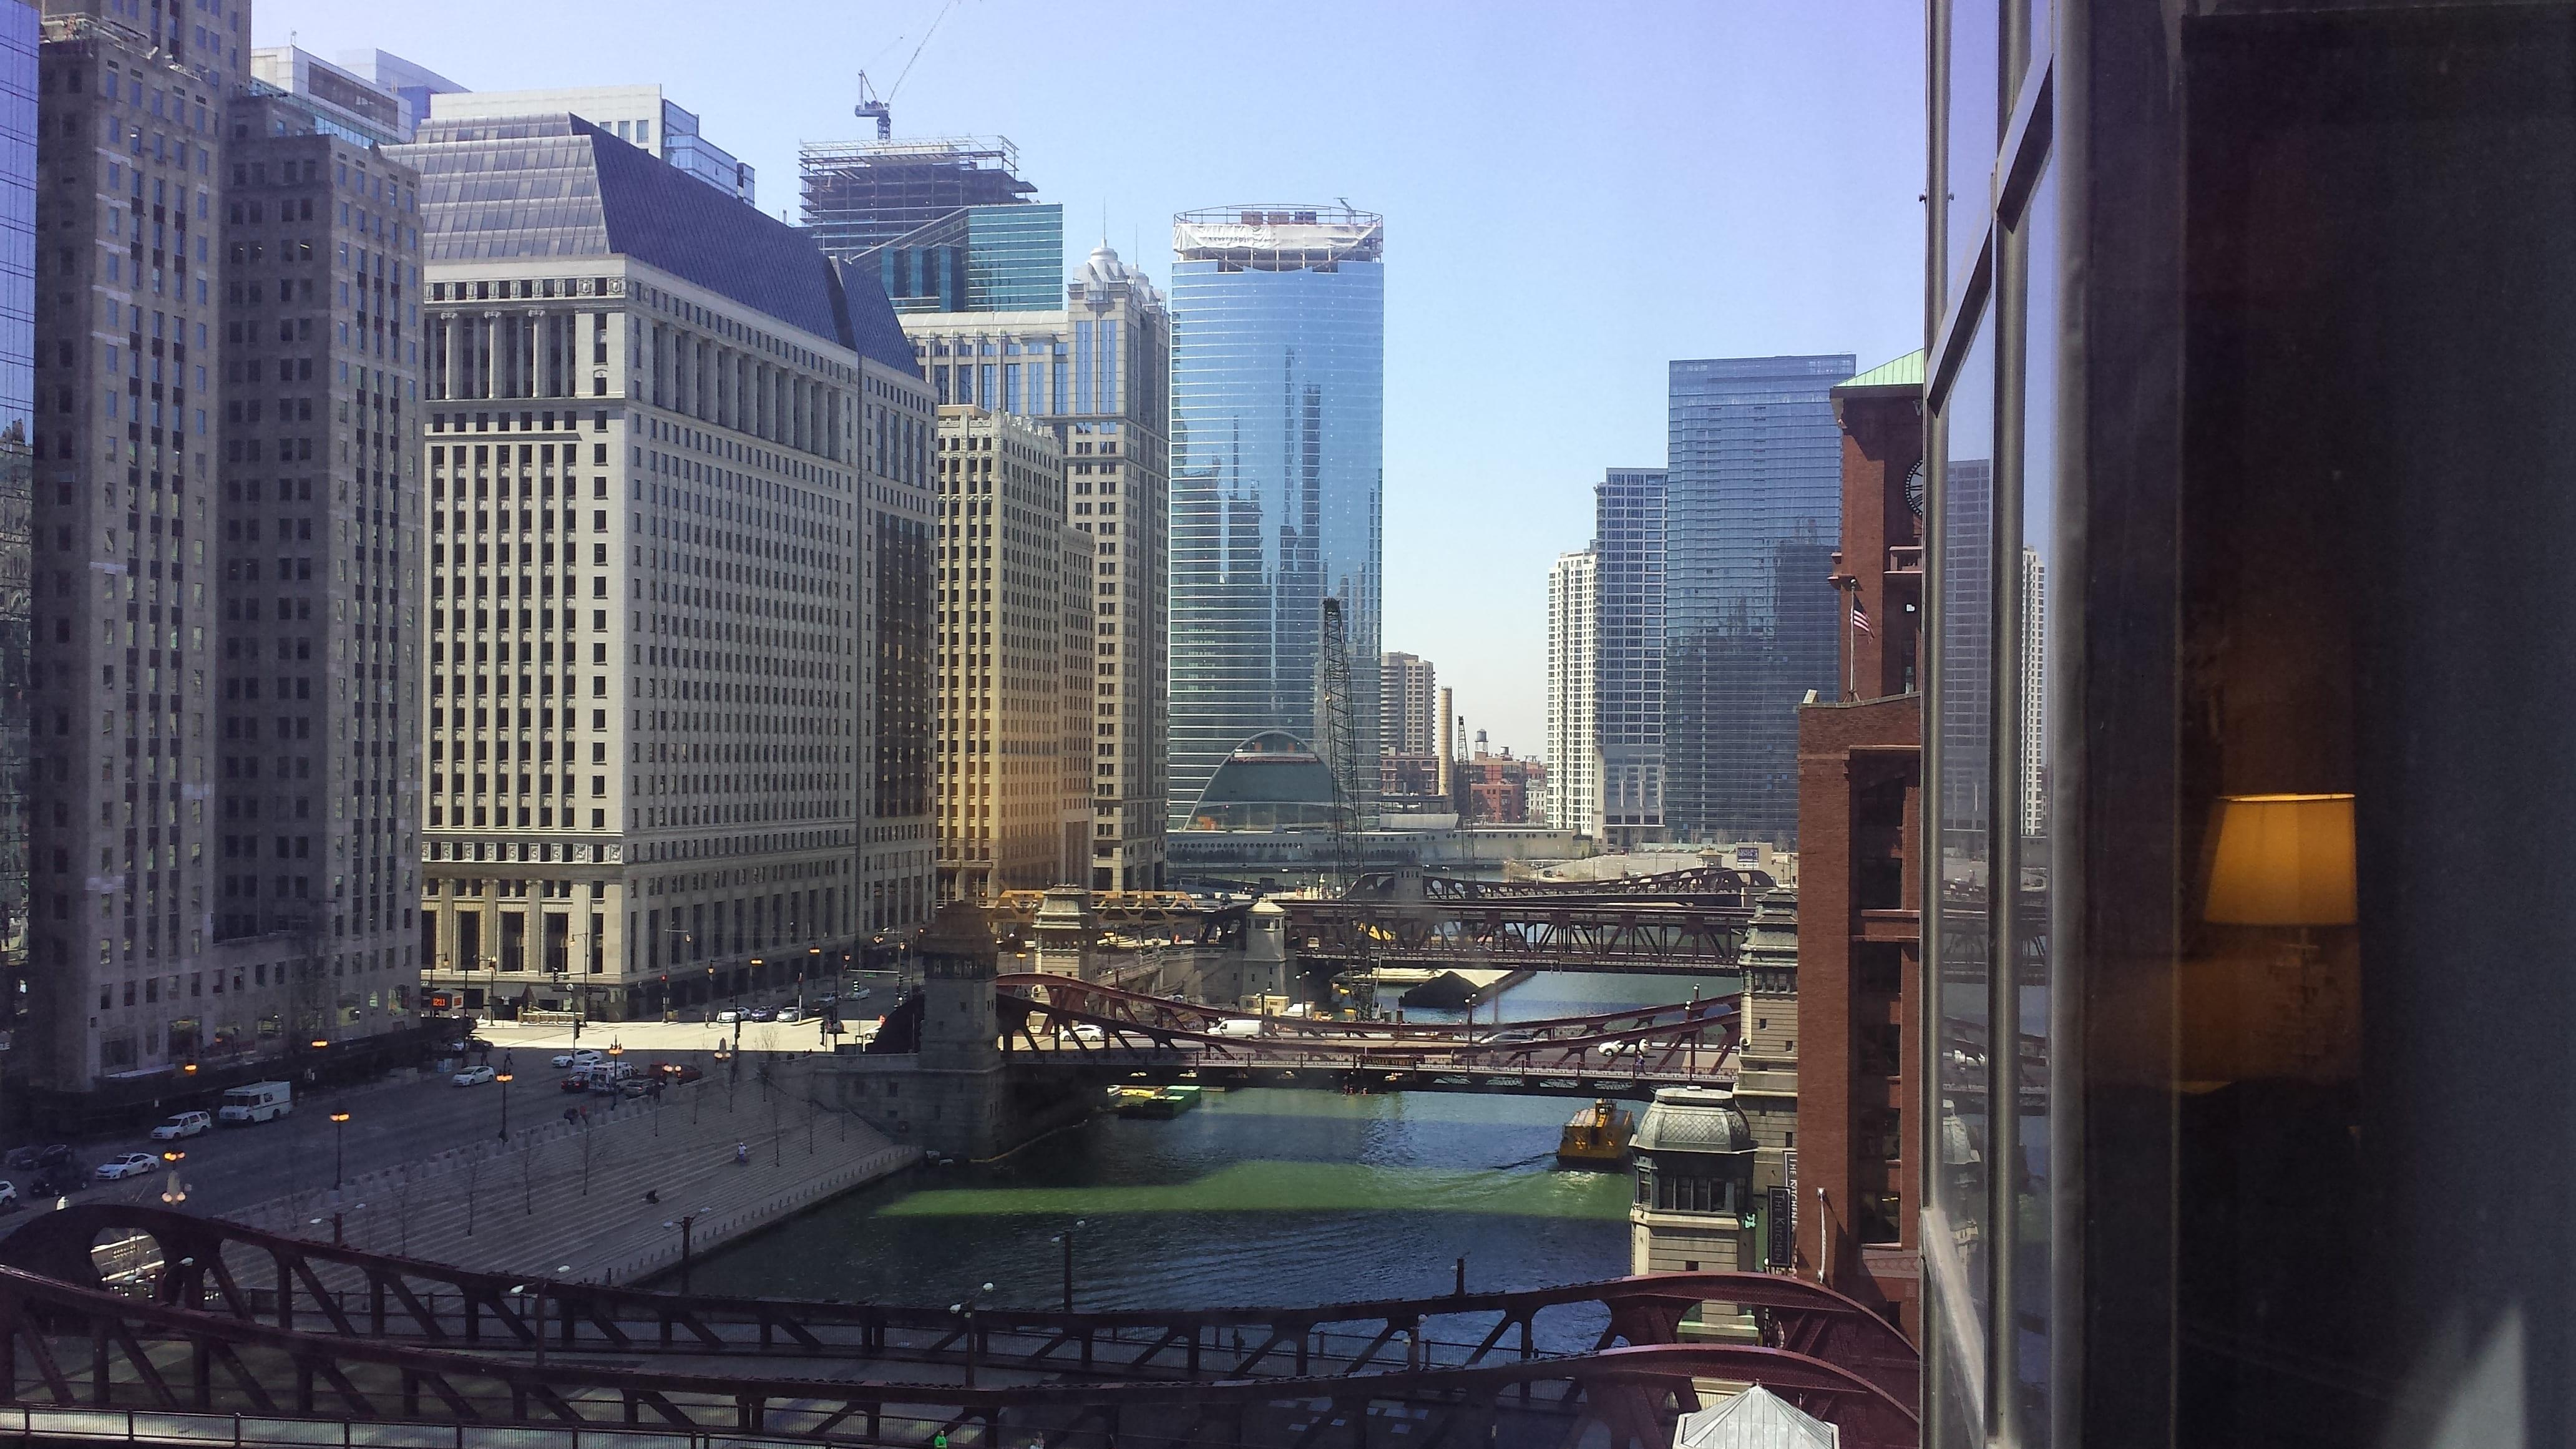 City of Chicago river skyline